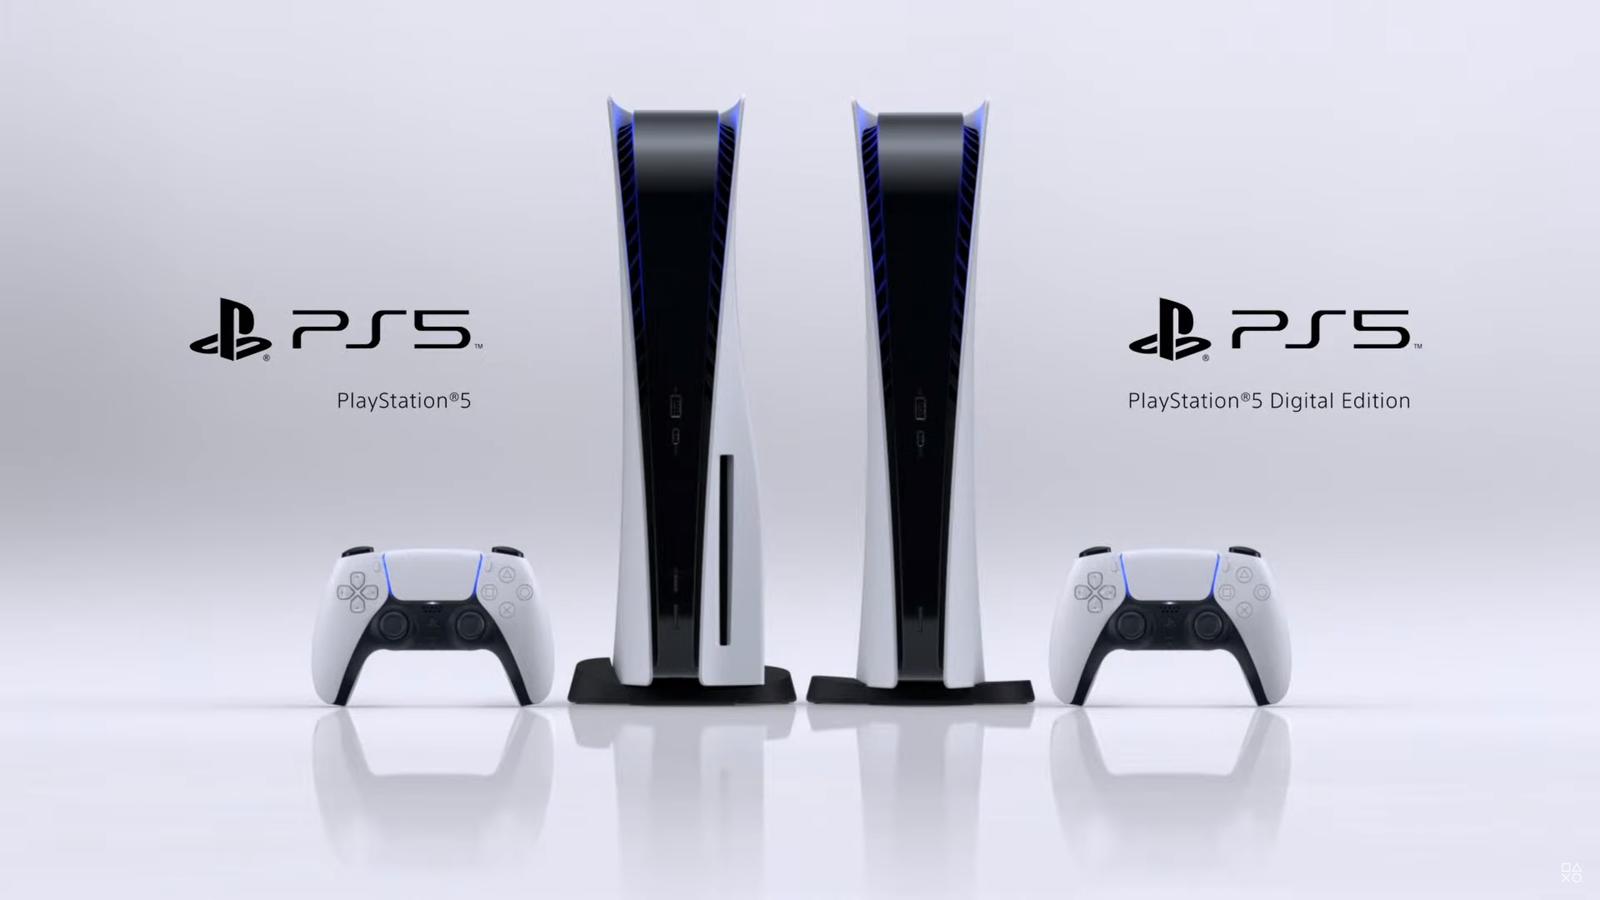 Elkjøp utsolgt for PlayStation 5 på sekunder